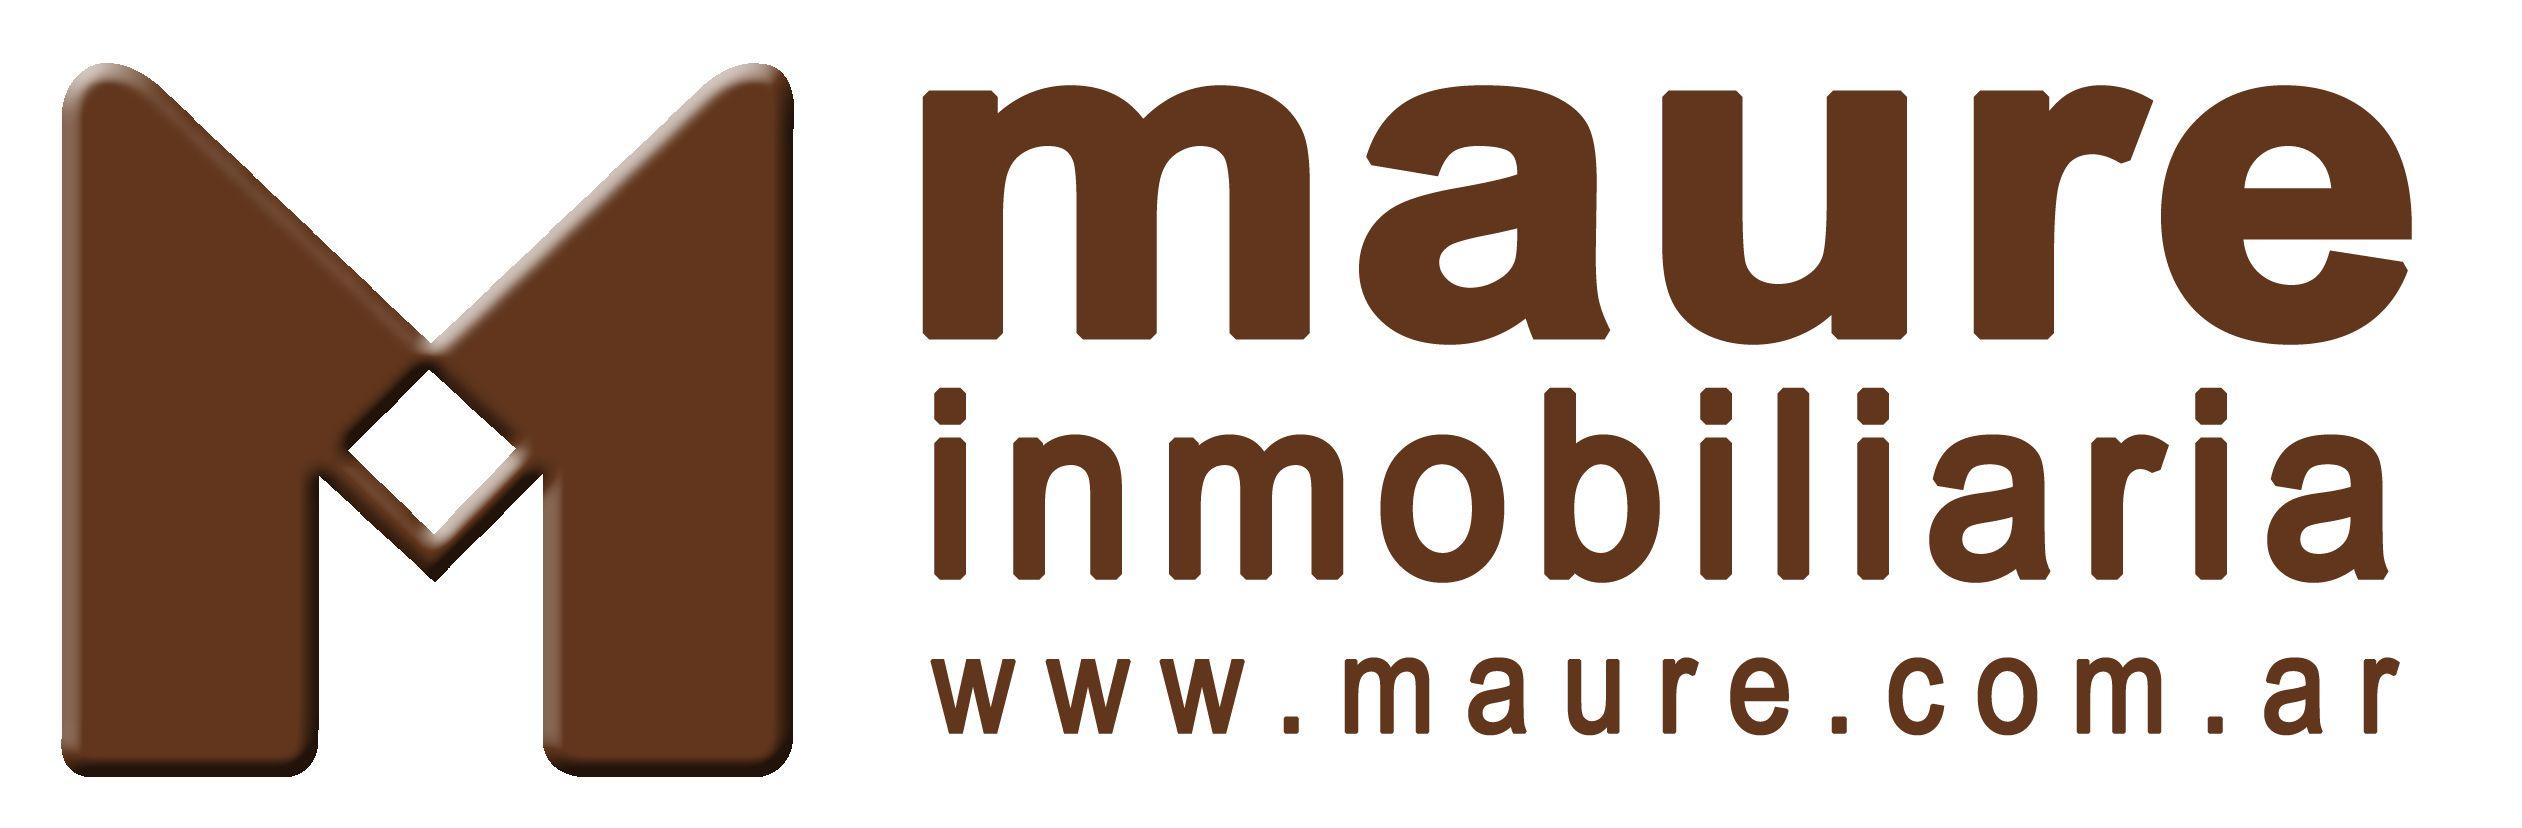 Logo de  Maure  Inmobiliaria